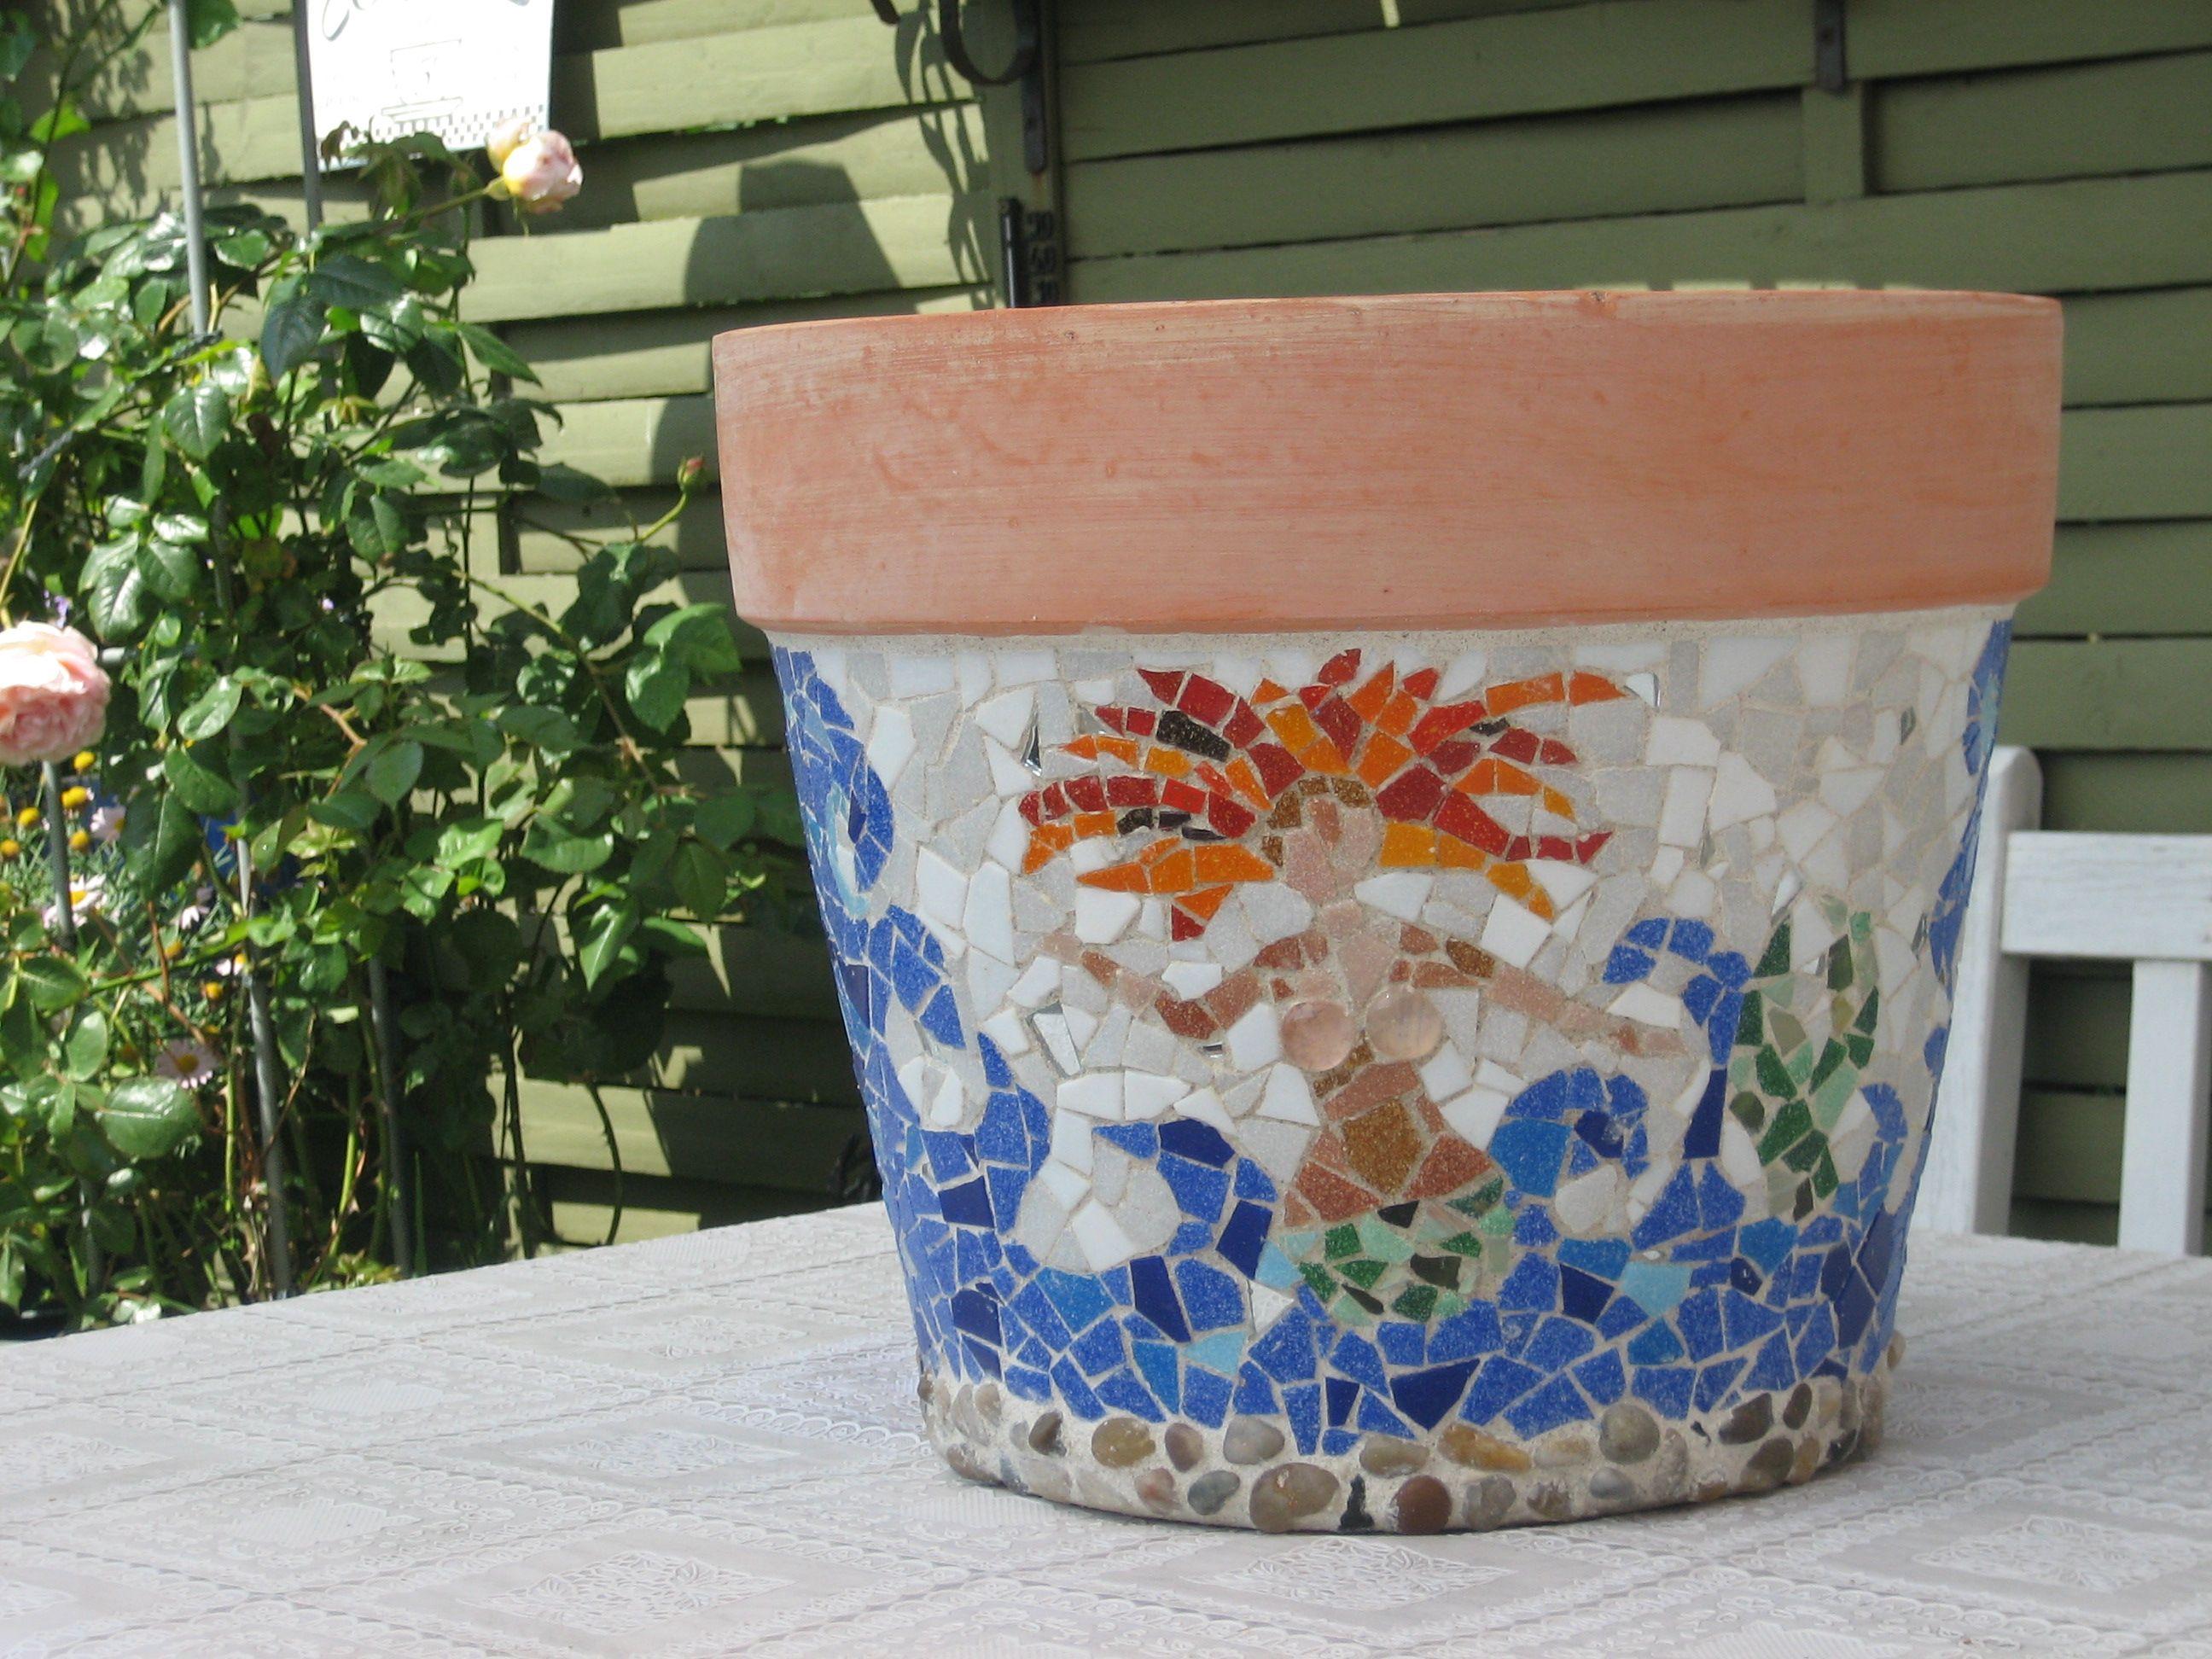 Stor mosaik havekrukke med havfrue big mosaic garden pot with stor mosaik havekrukke med havfrue big mosaic garden pot with mermaid workwithnaturefo